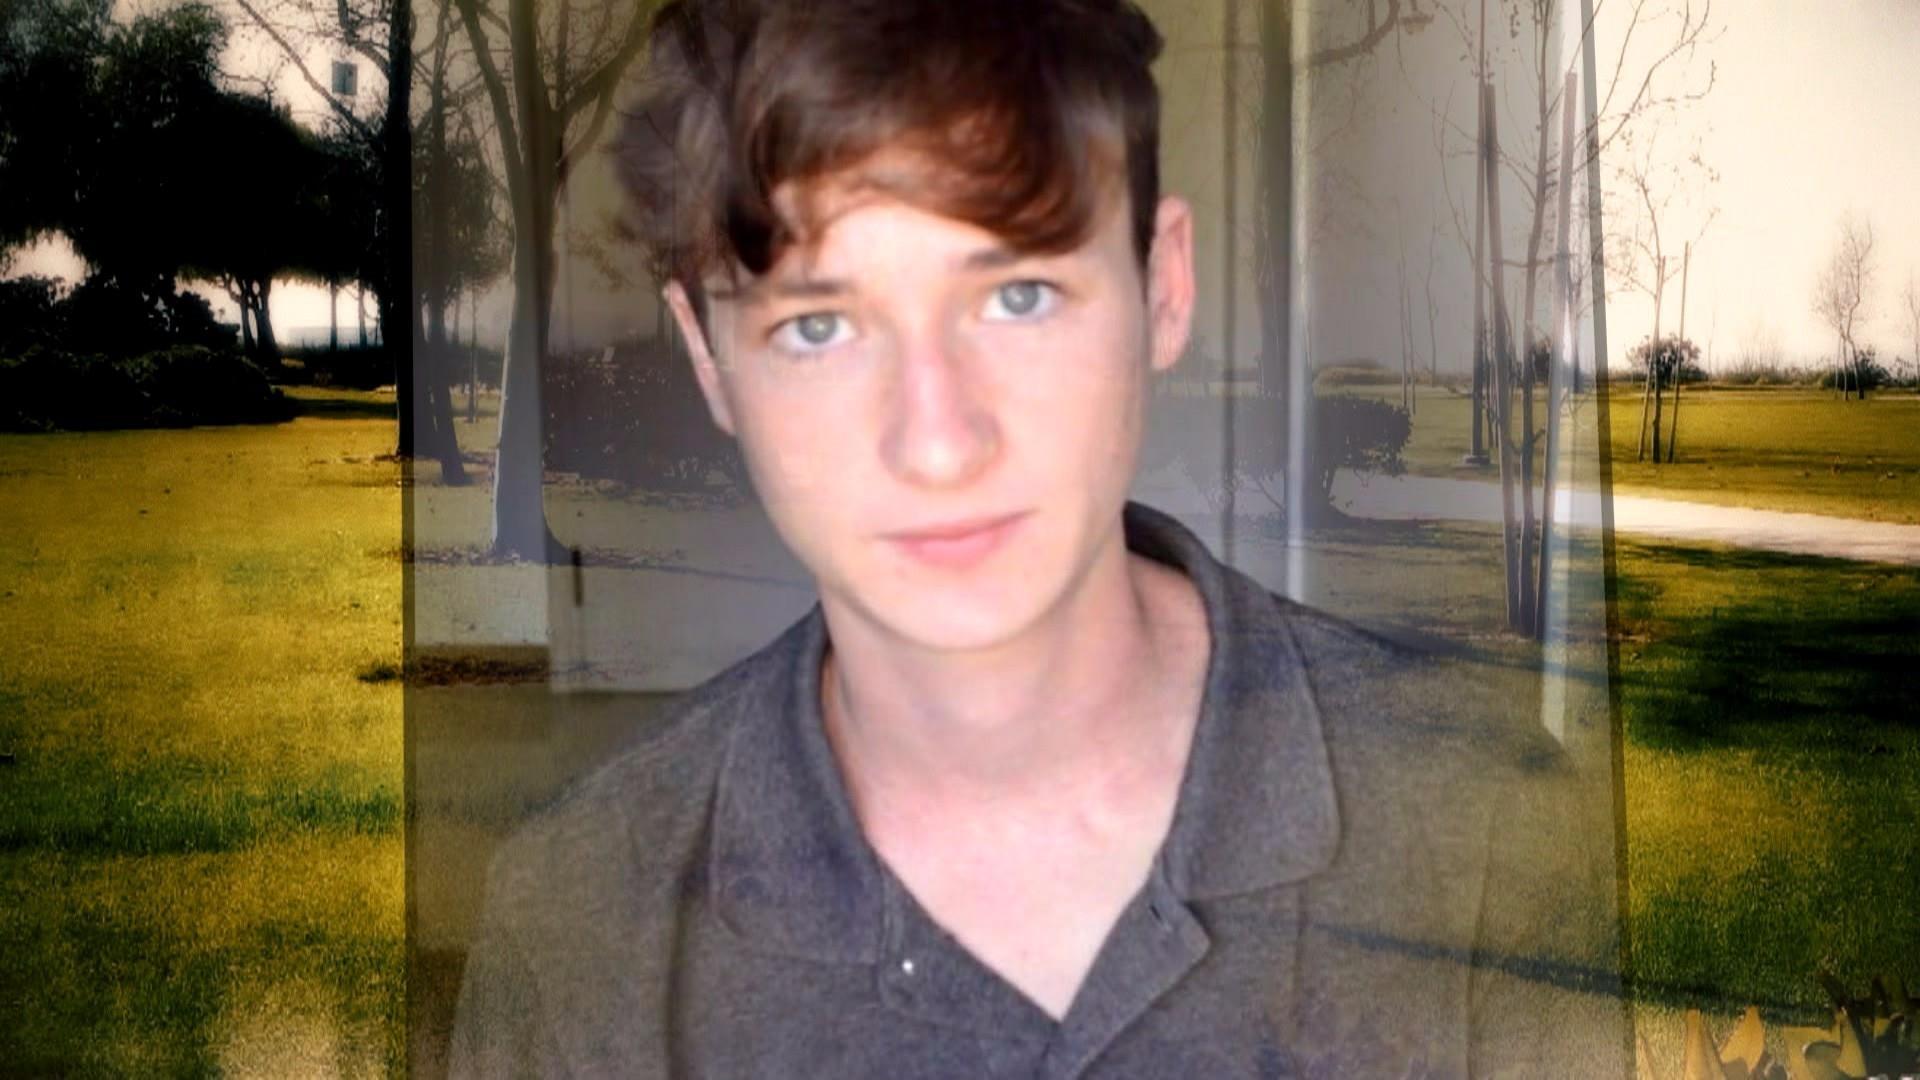 Investigation continues into death of UPenn student Blaze Bernstein